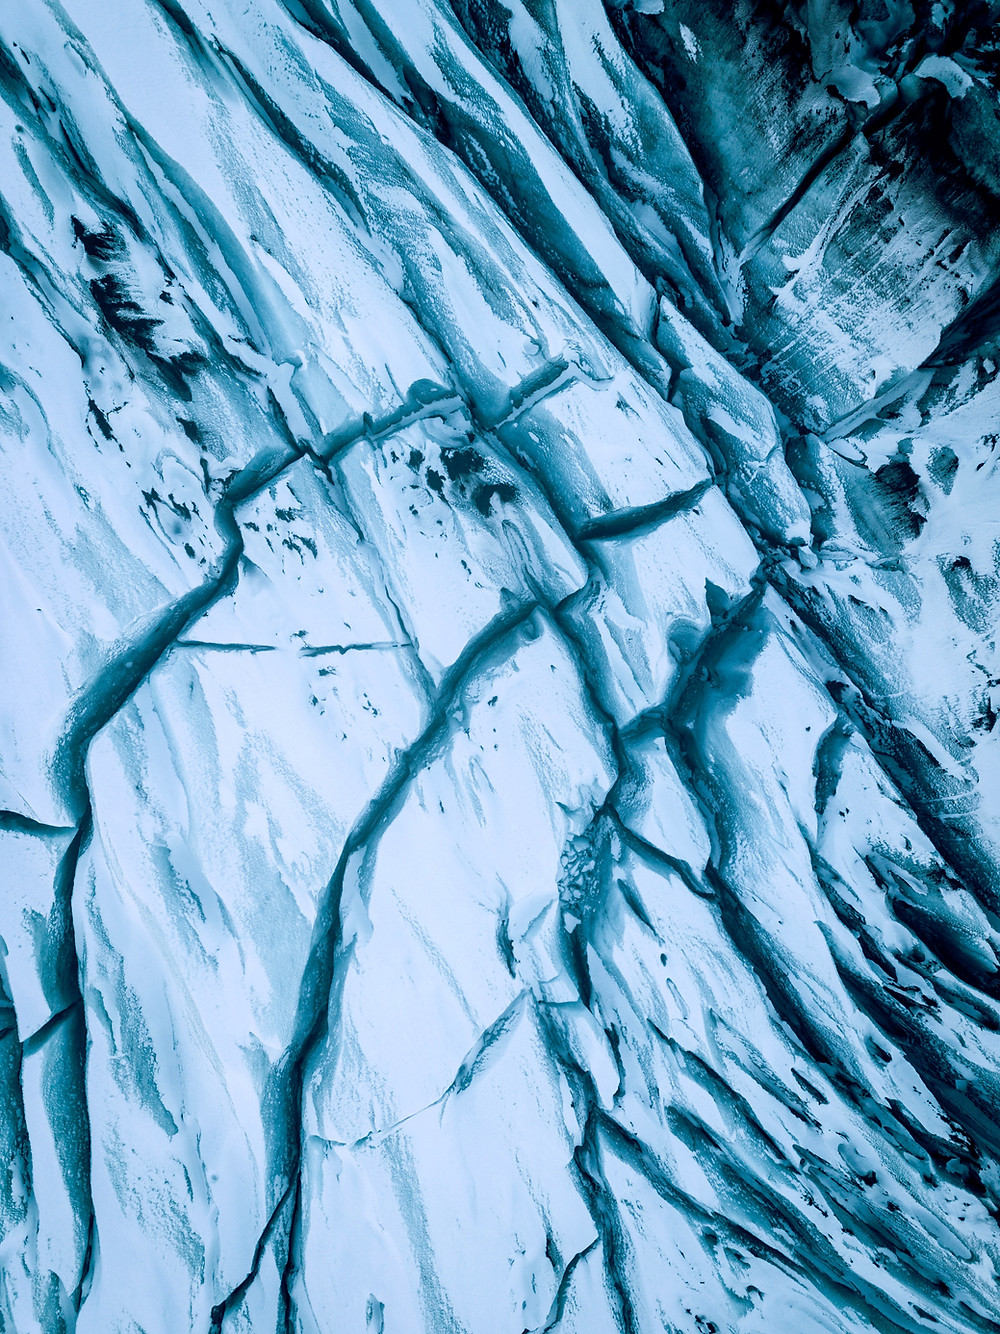 Crevasses in the ice